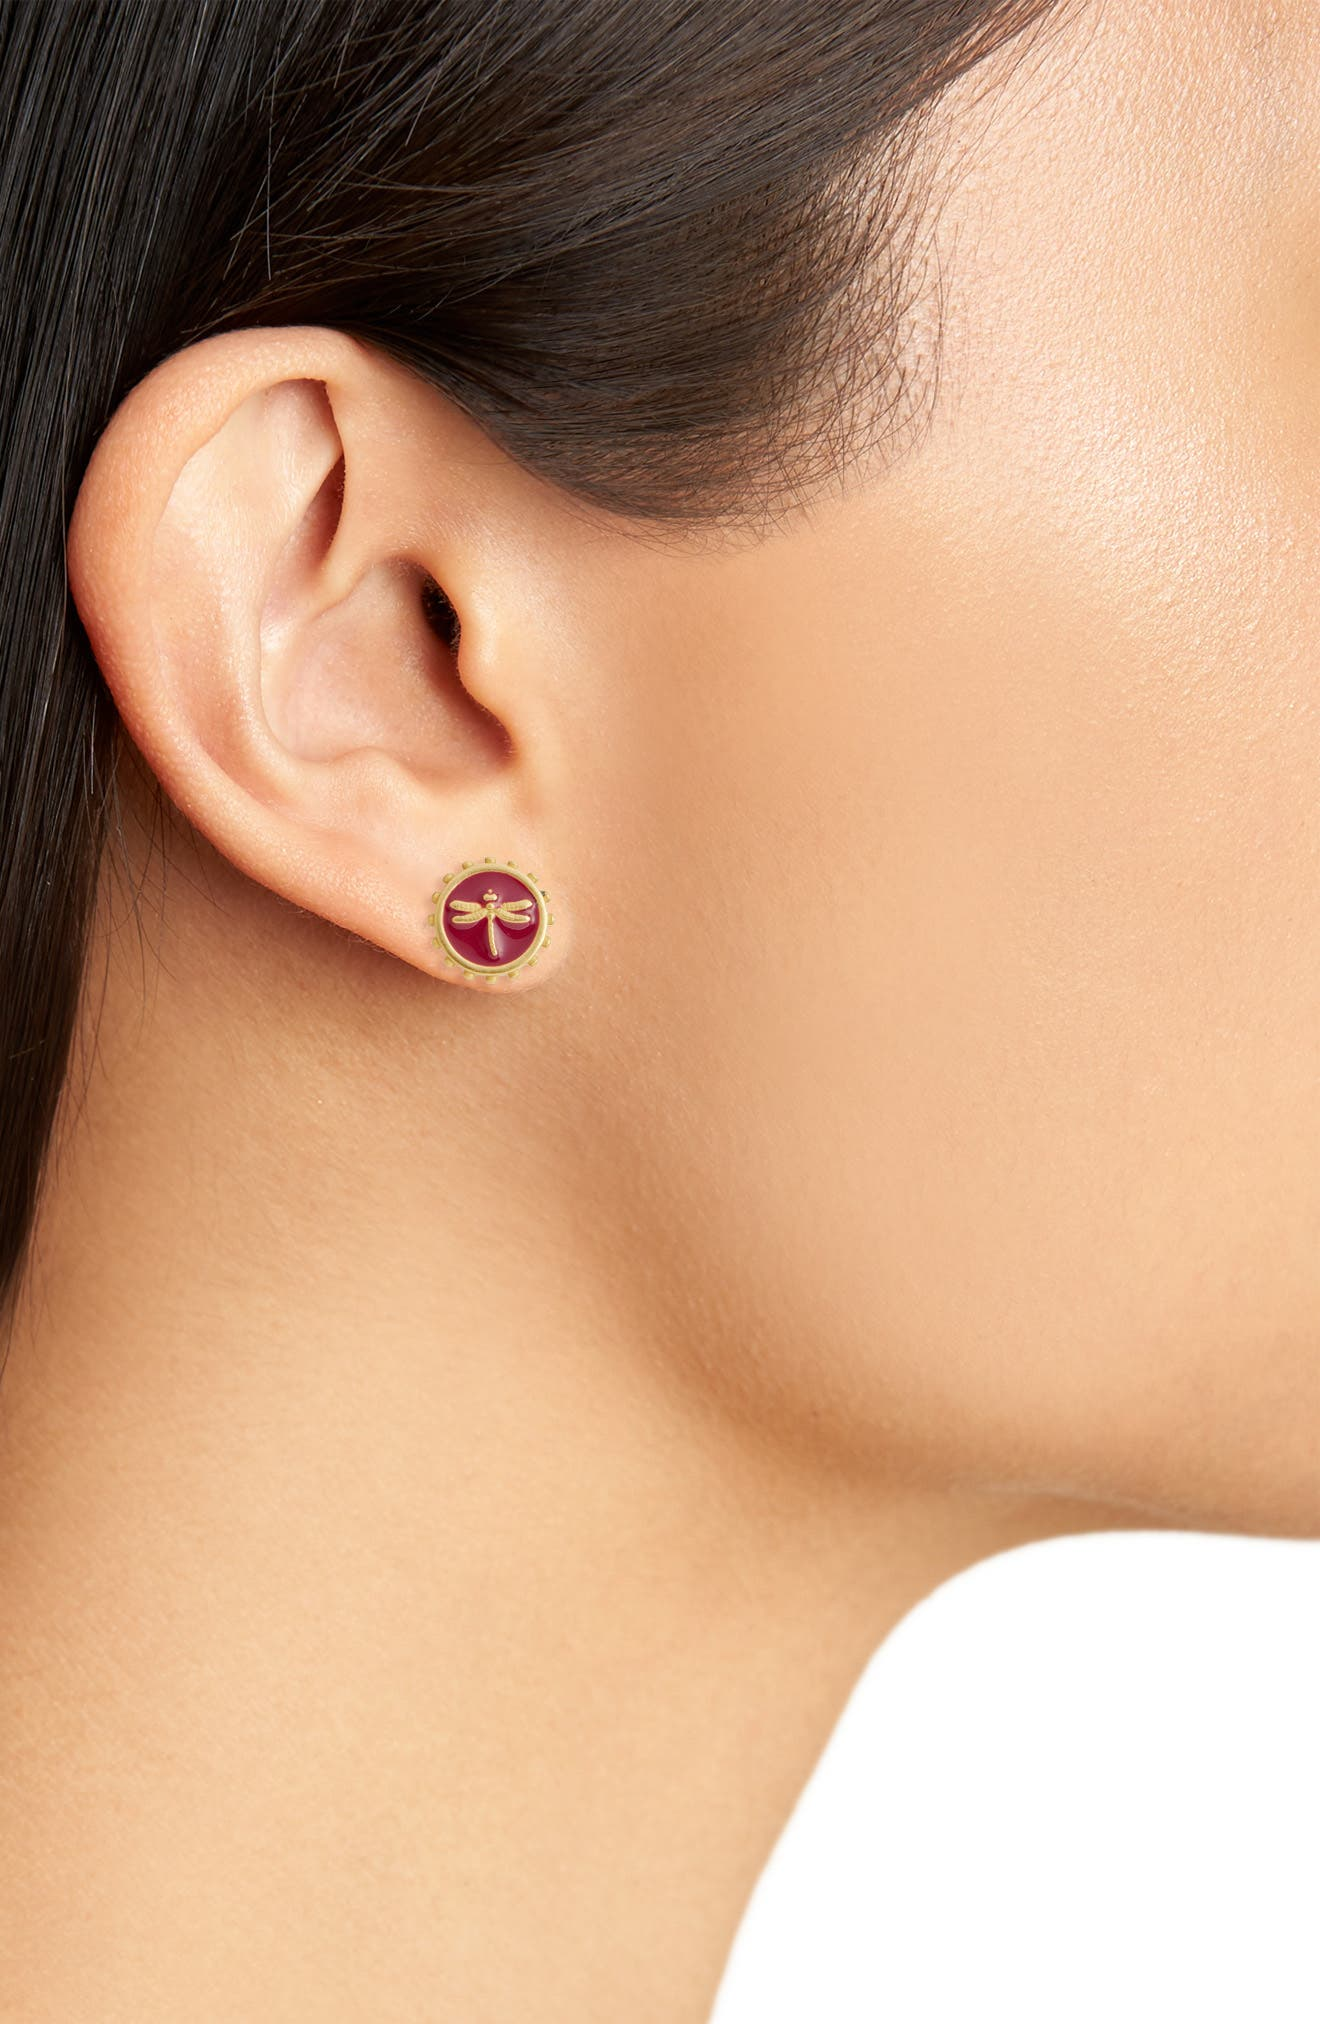 Dragonfly Charm Stud Earrings,                             Alternate thumbnail 2, color,                             710